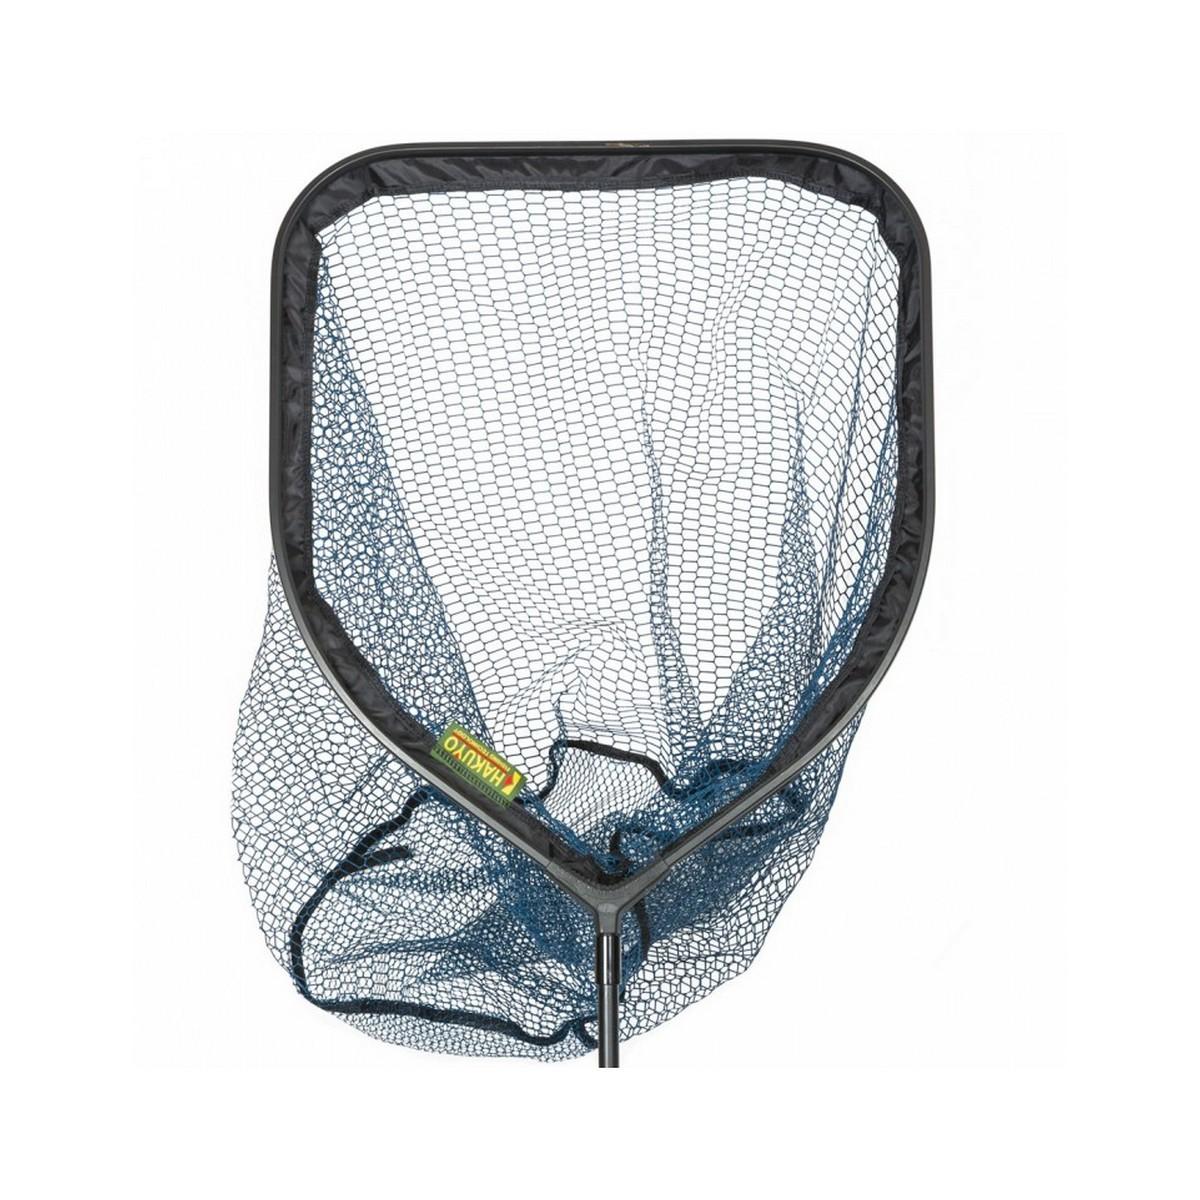 Глава за кеп Hakuyo с гумирана мрежа